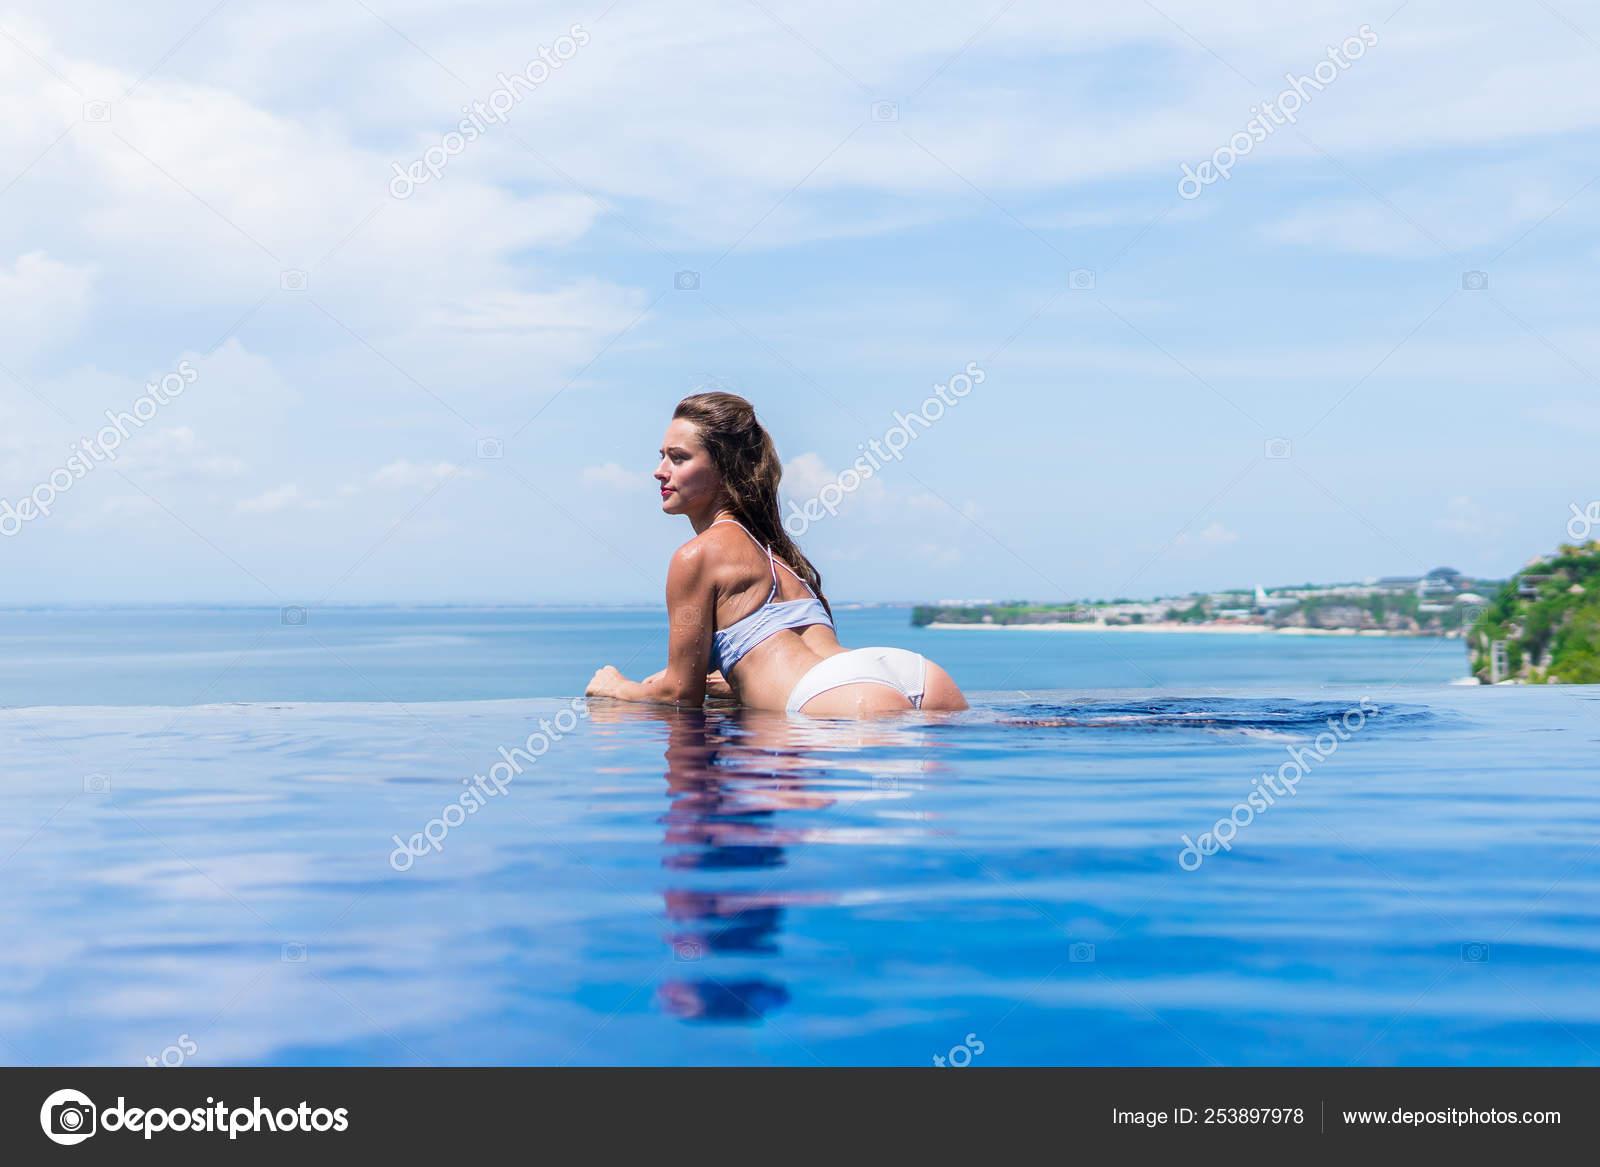 Nice Ass Butt sexy girl. beautiful woman. model lady bikini underwear big ass butt booty sit edge of water swim pool on the roof of luxury resort hotel nice sea